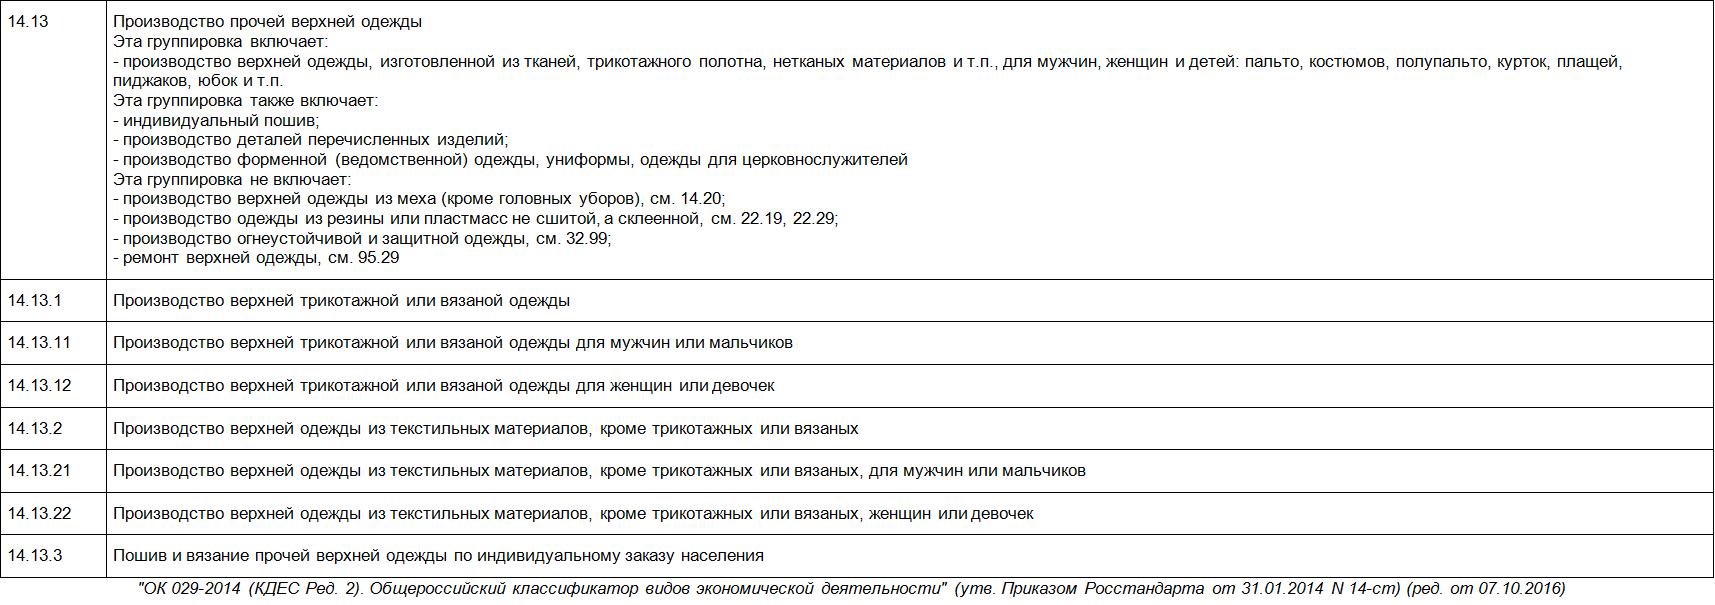 ОКВЭД 14.13 расшифровка